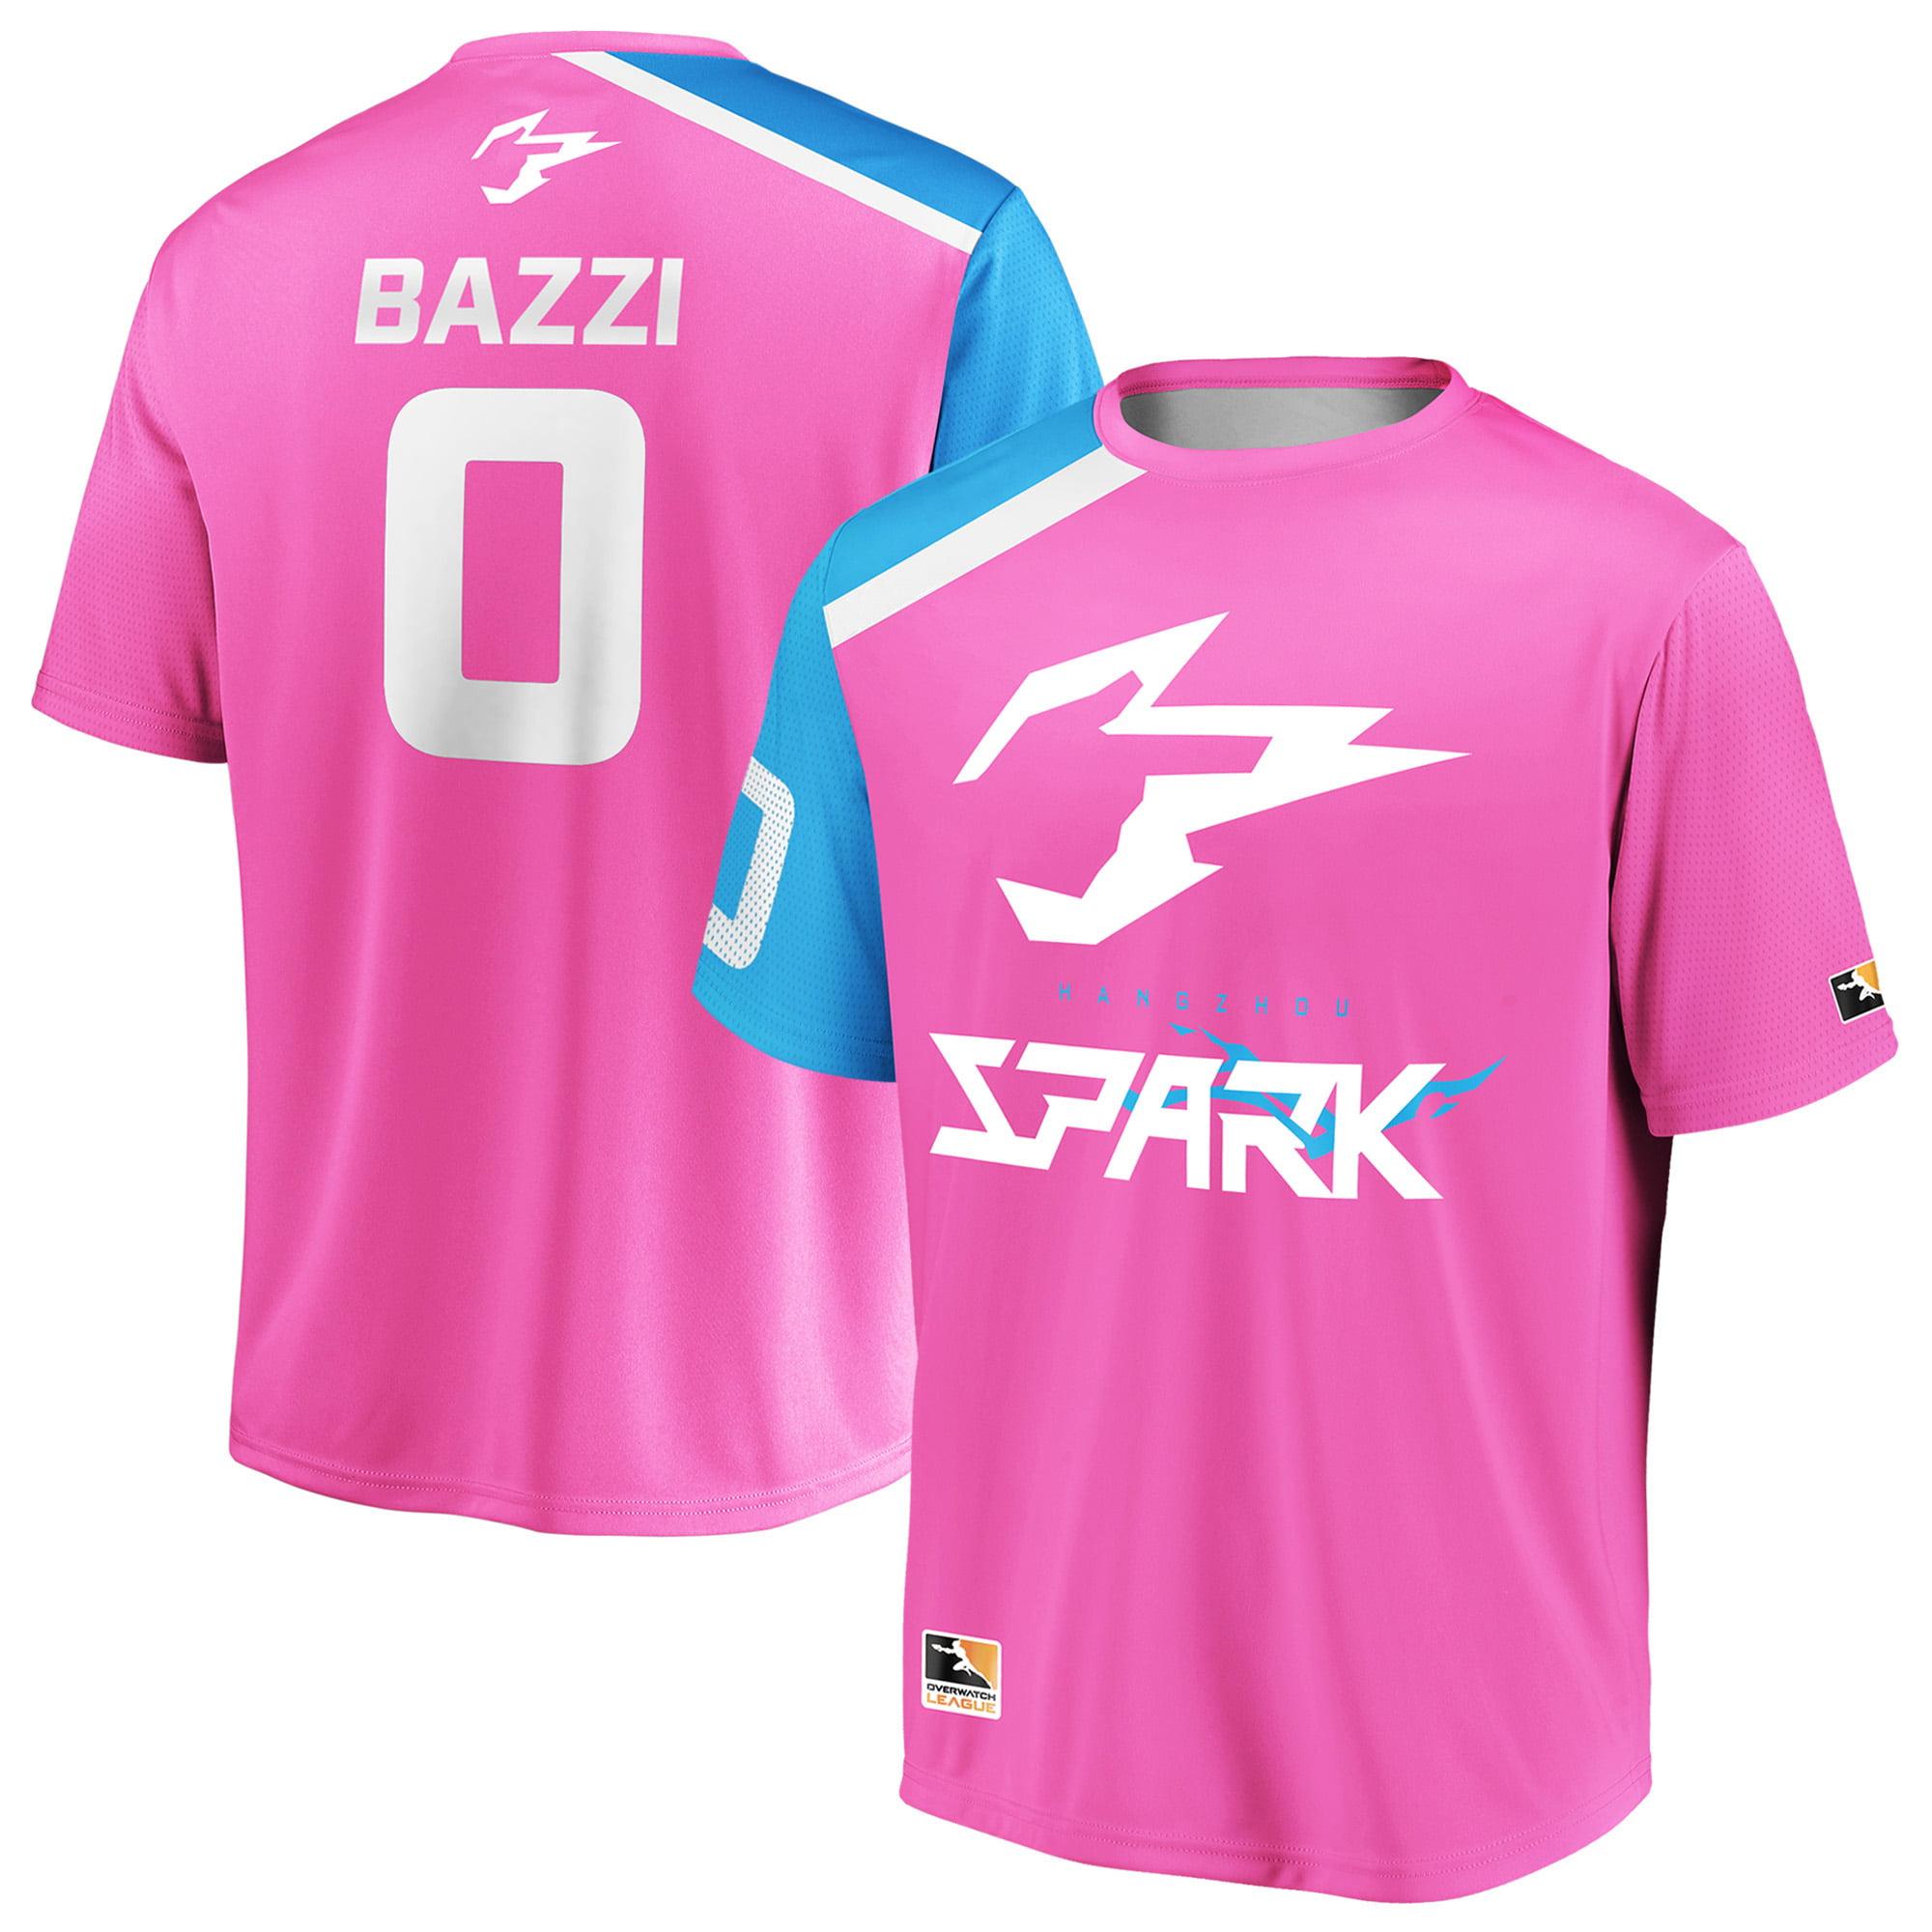 Bazzi Hangzhou Spark Overwatch League Replica Home Jersey - Pink